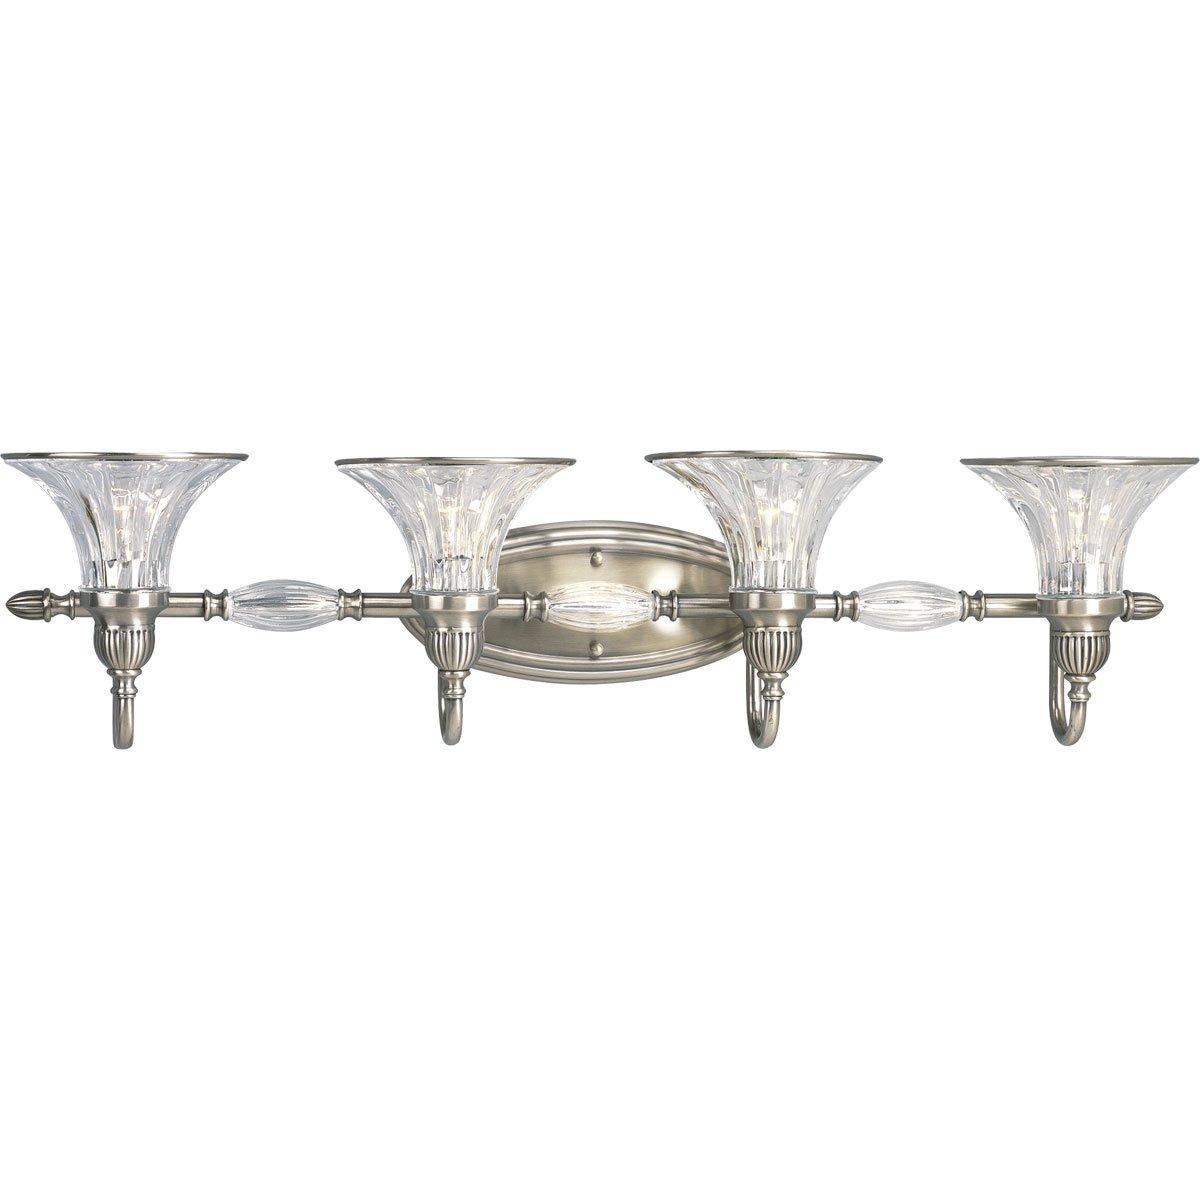 Progress Lighting P2728 101 4 Light Roxbury Bath Bracket, Classic Silver   Vanity  Lighting Fixtures   Amazon.com